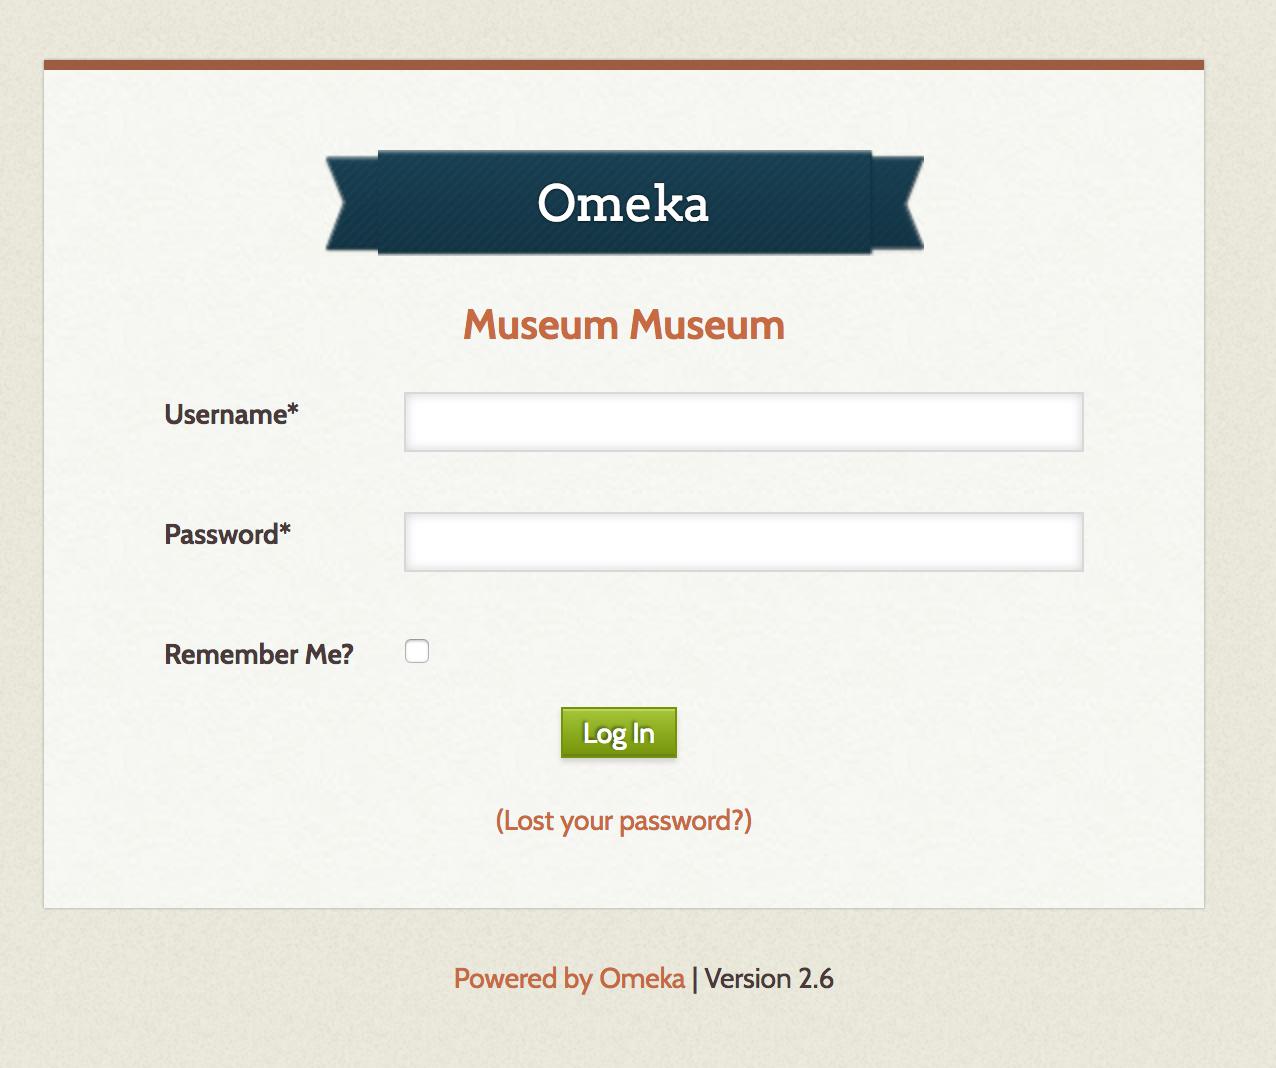 The Omeka login screen